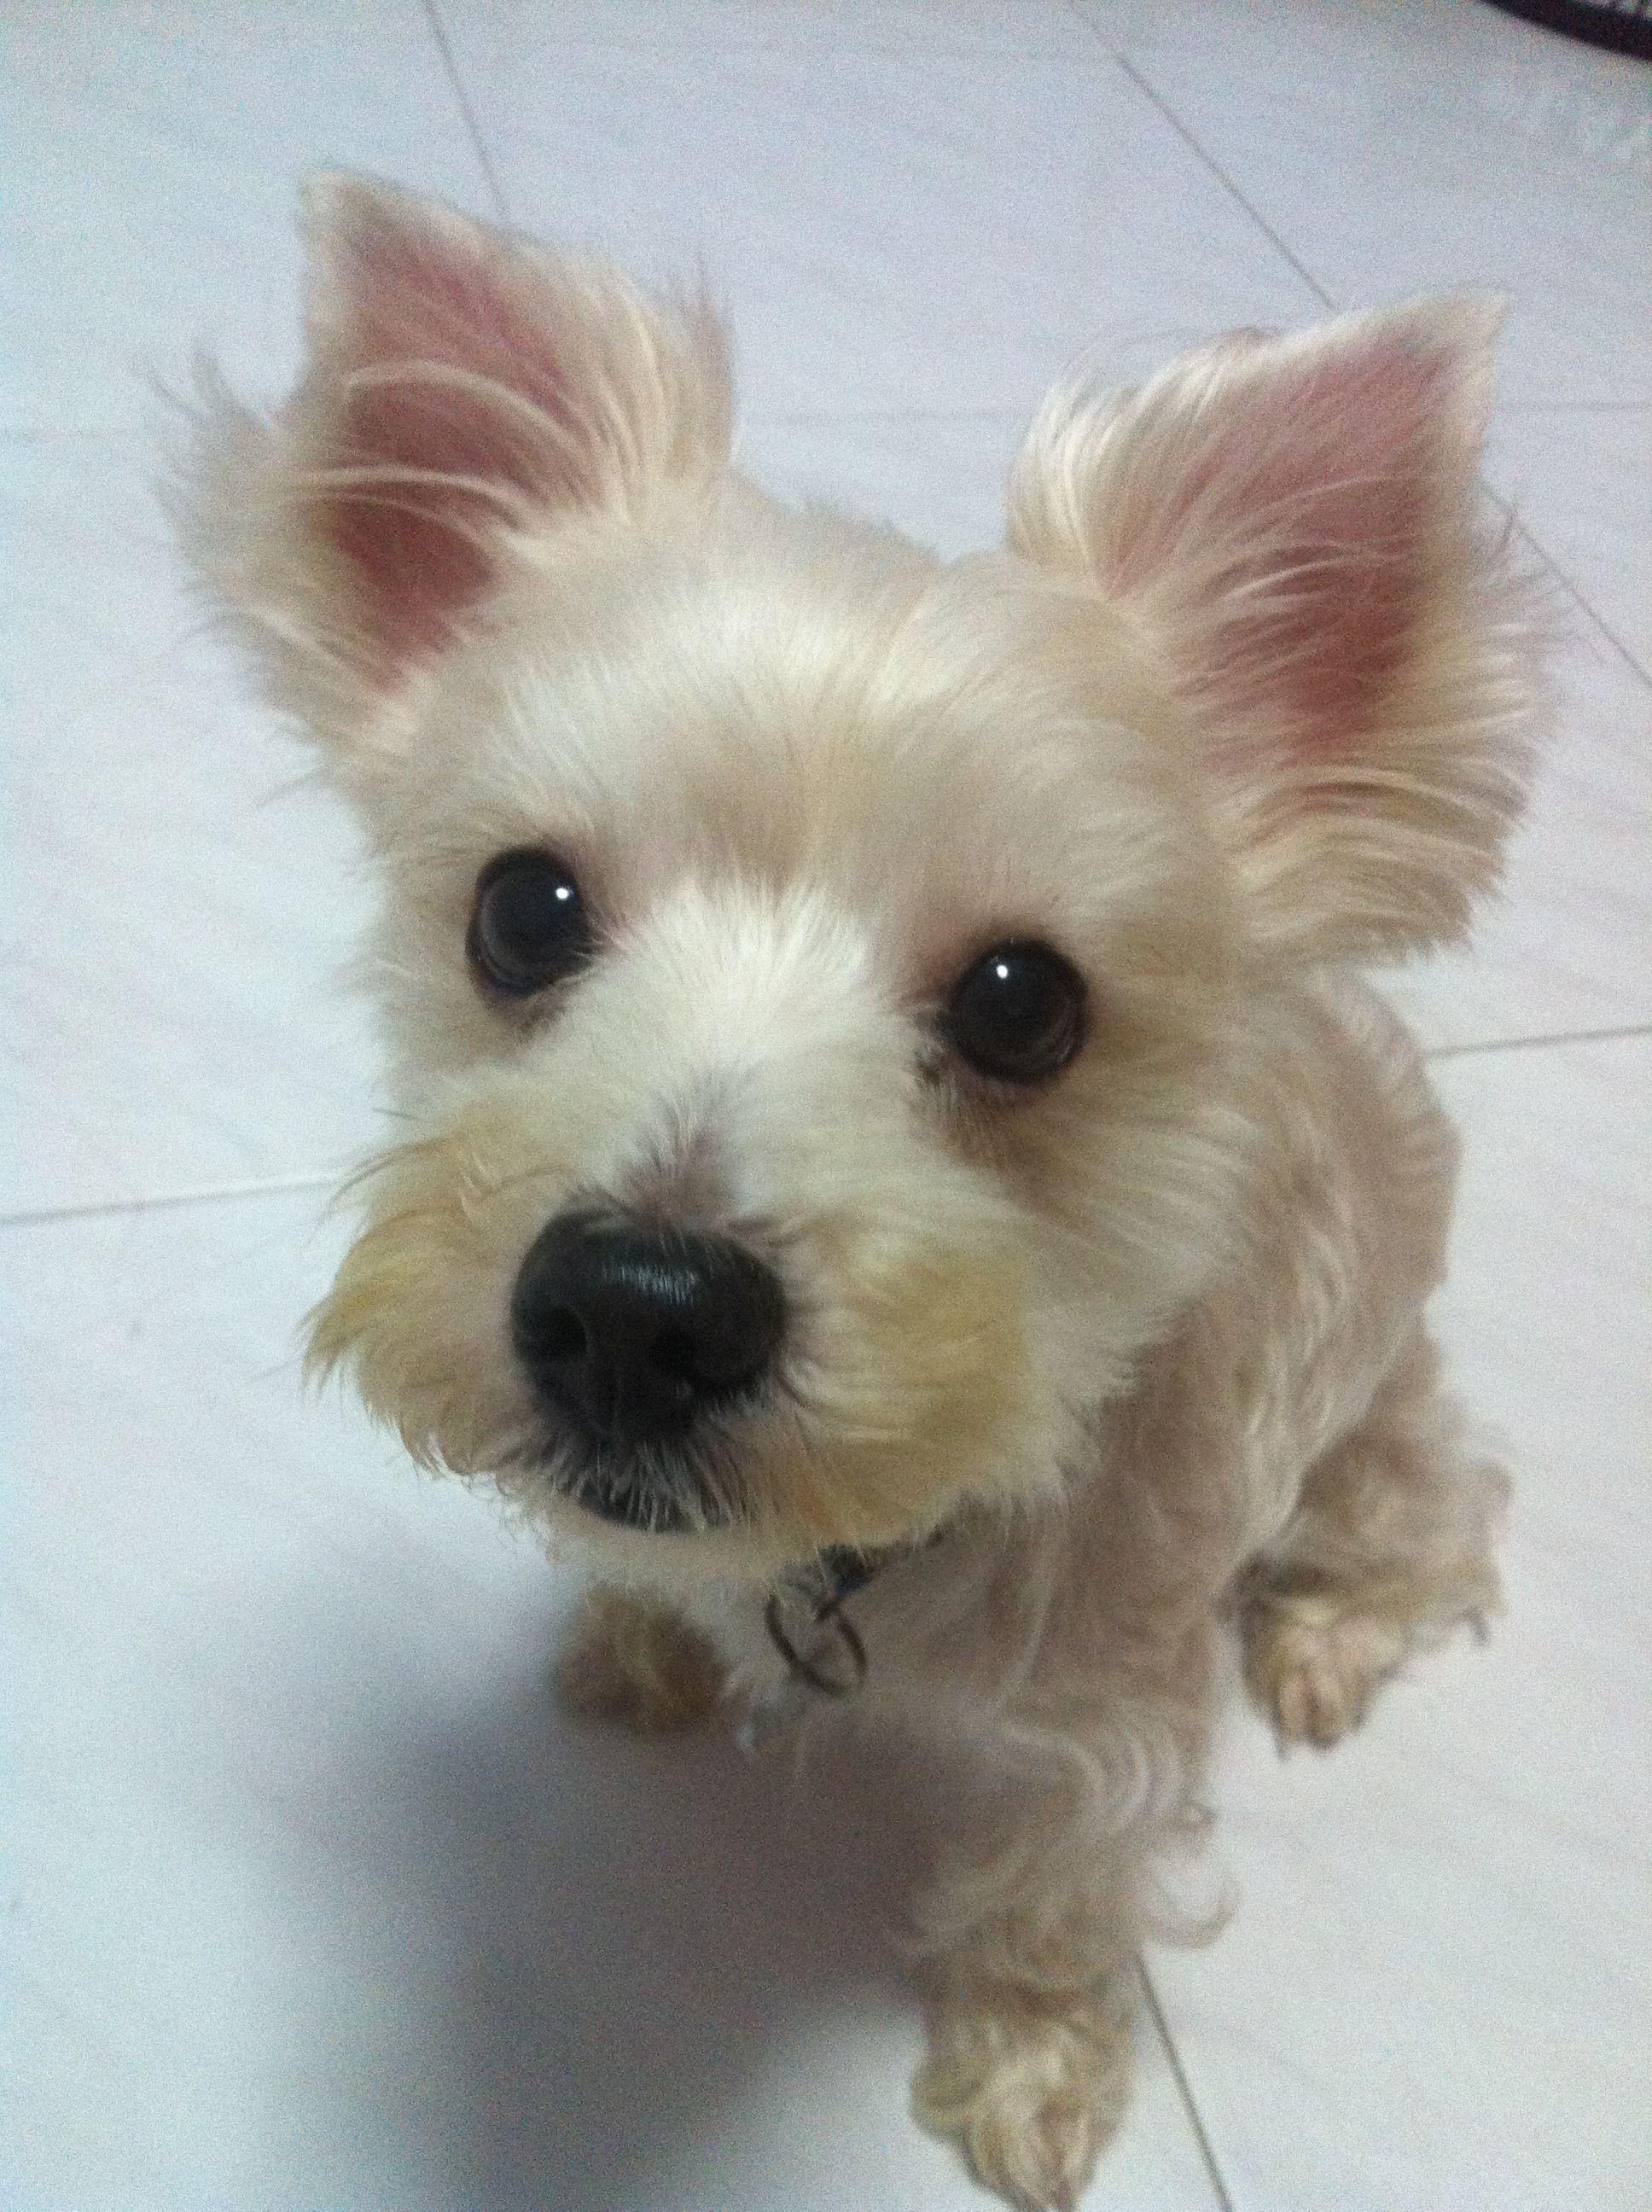 Gucci Chihuahua X Yorkshire Terrier Pawshake Met Afbeeldingen